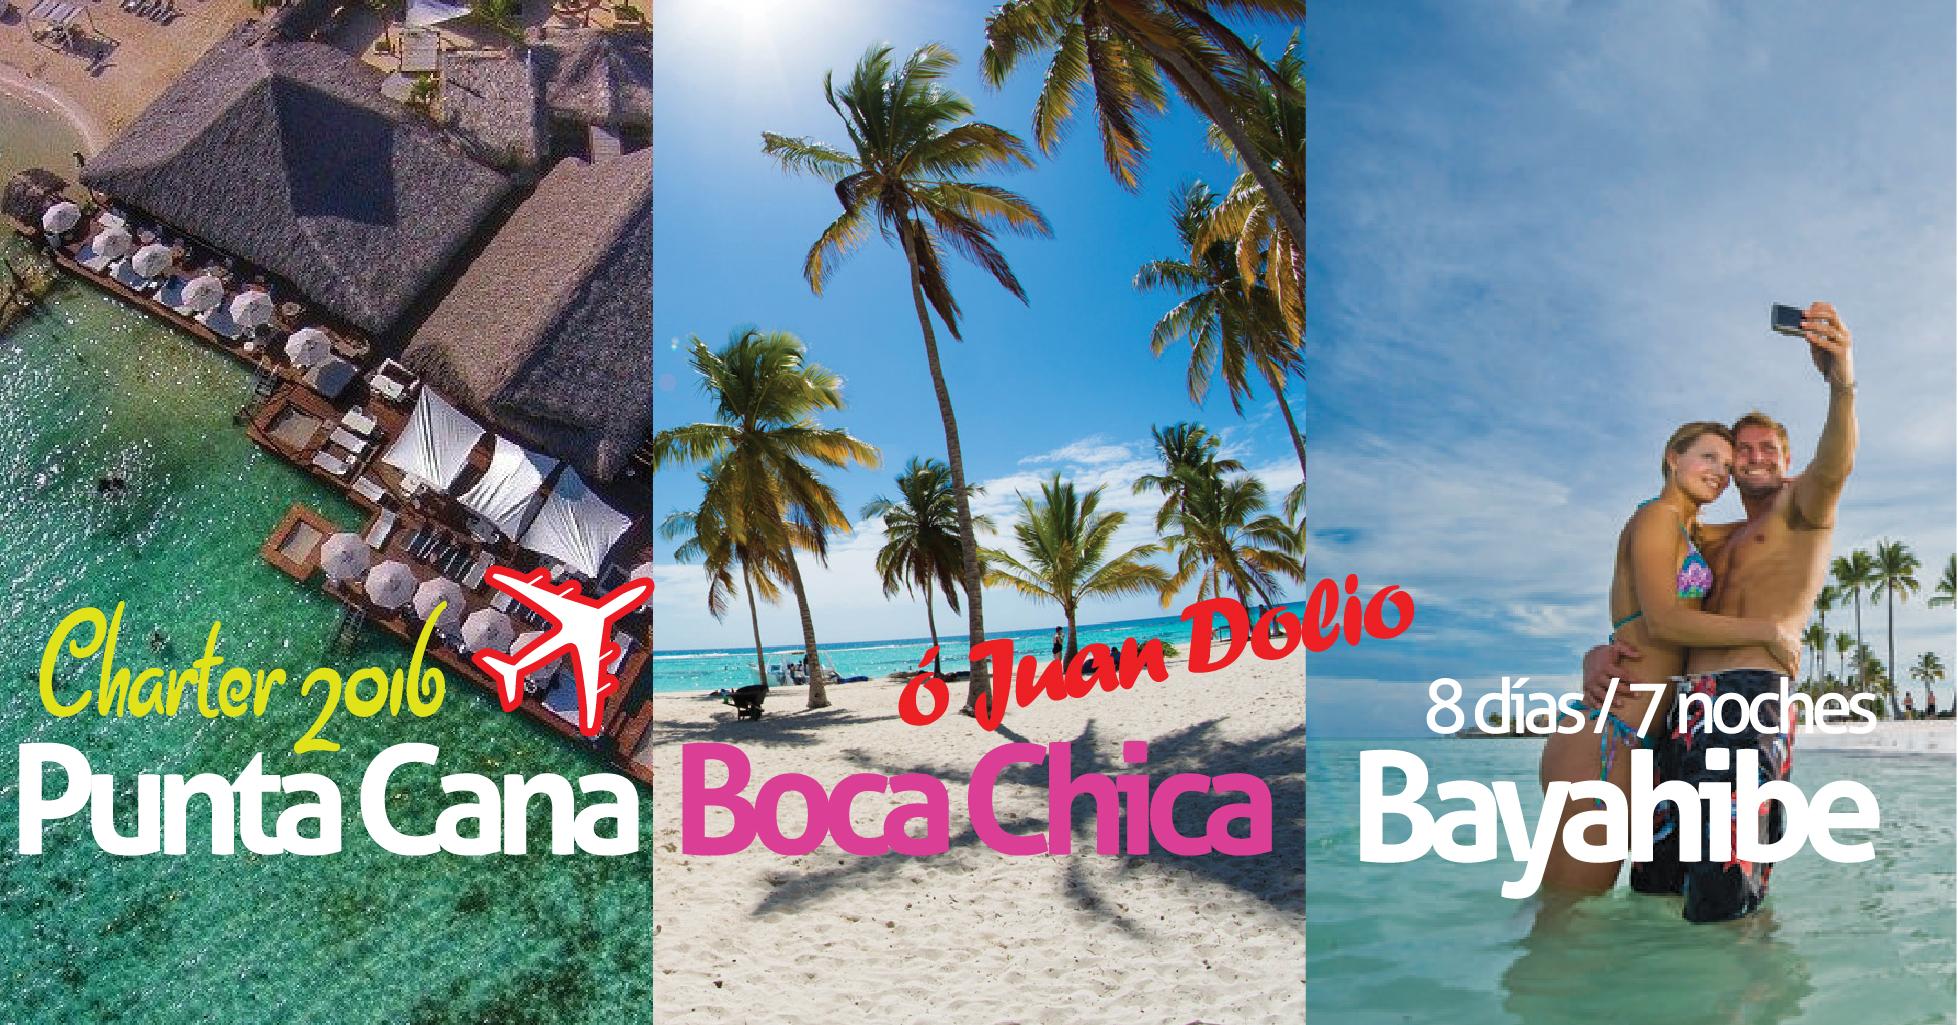 Punta Cana, Boca Chica y Bayahibe